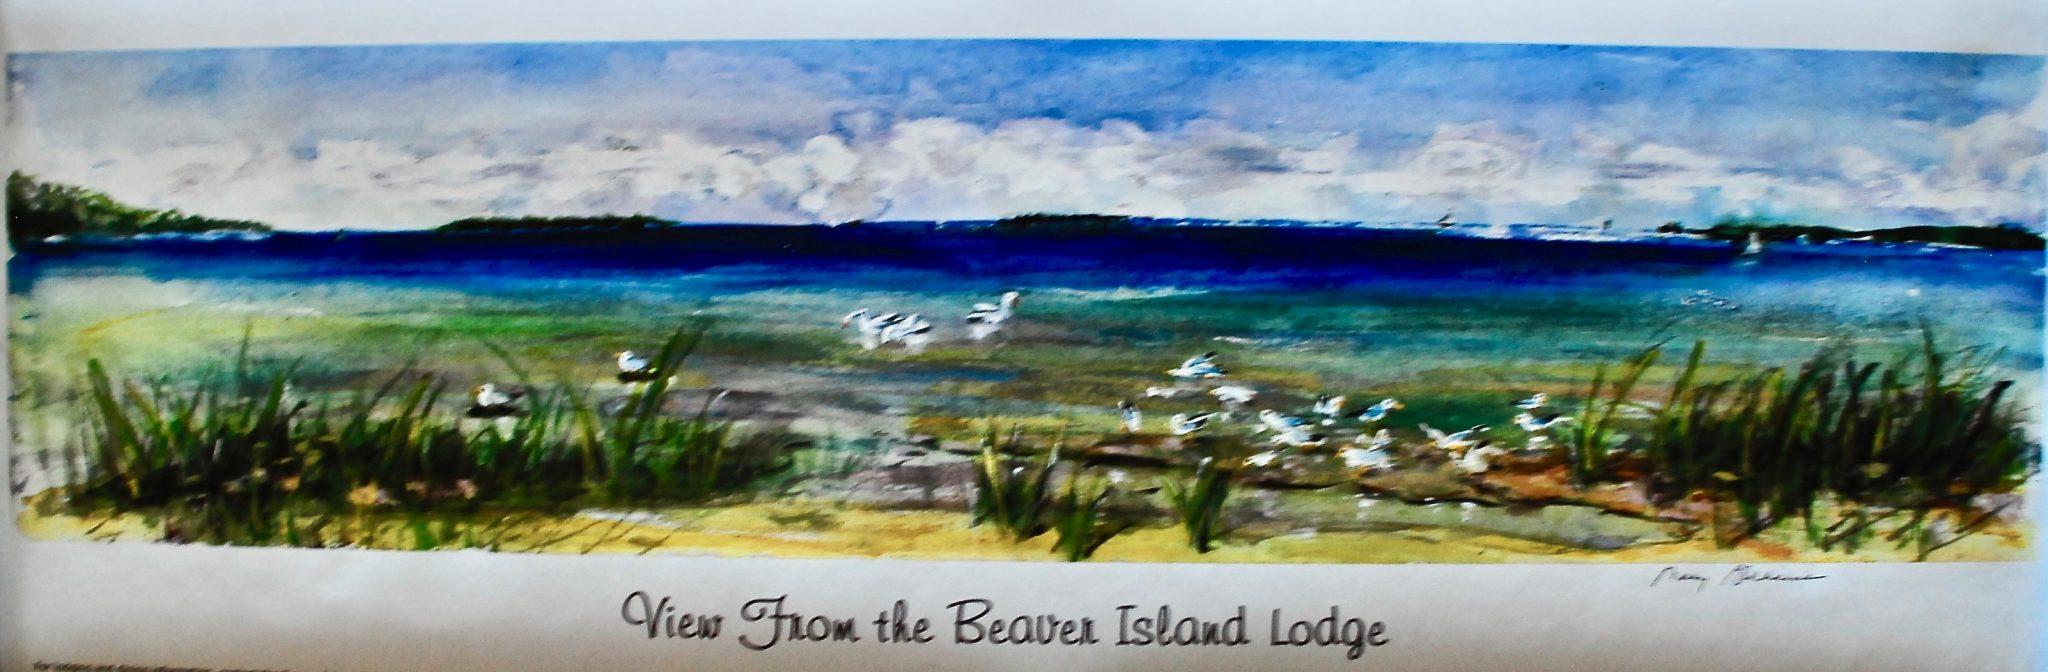 lake michigan view from the beaver island lodge